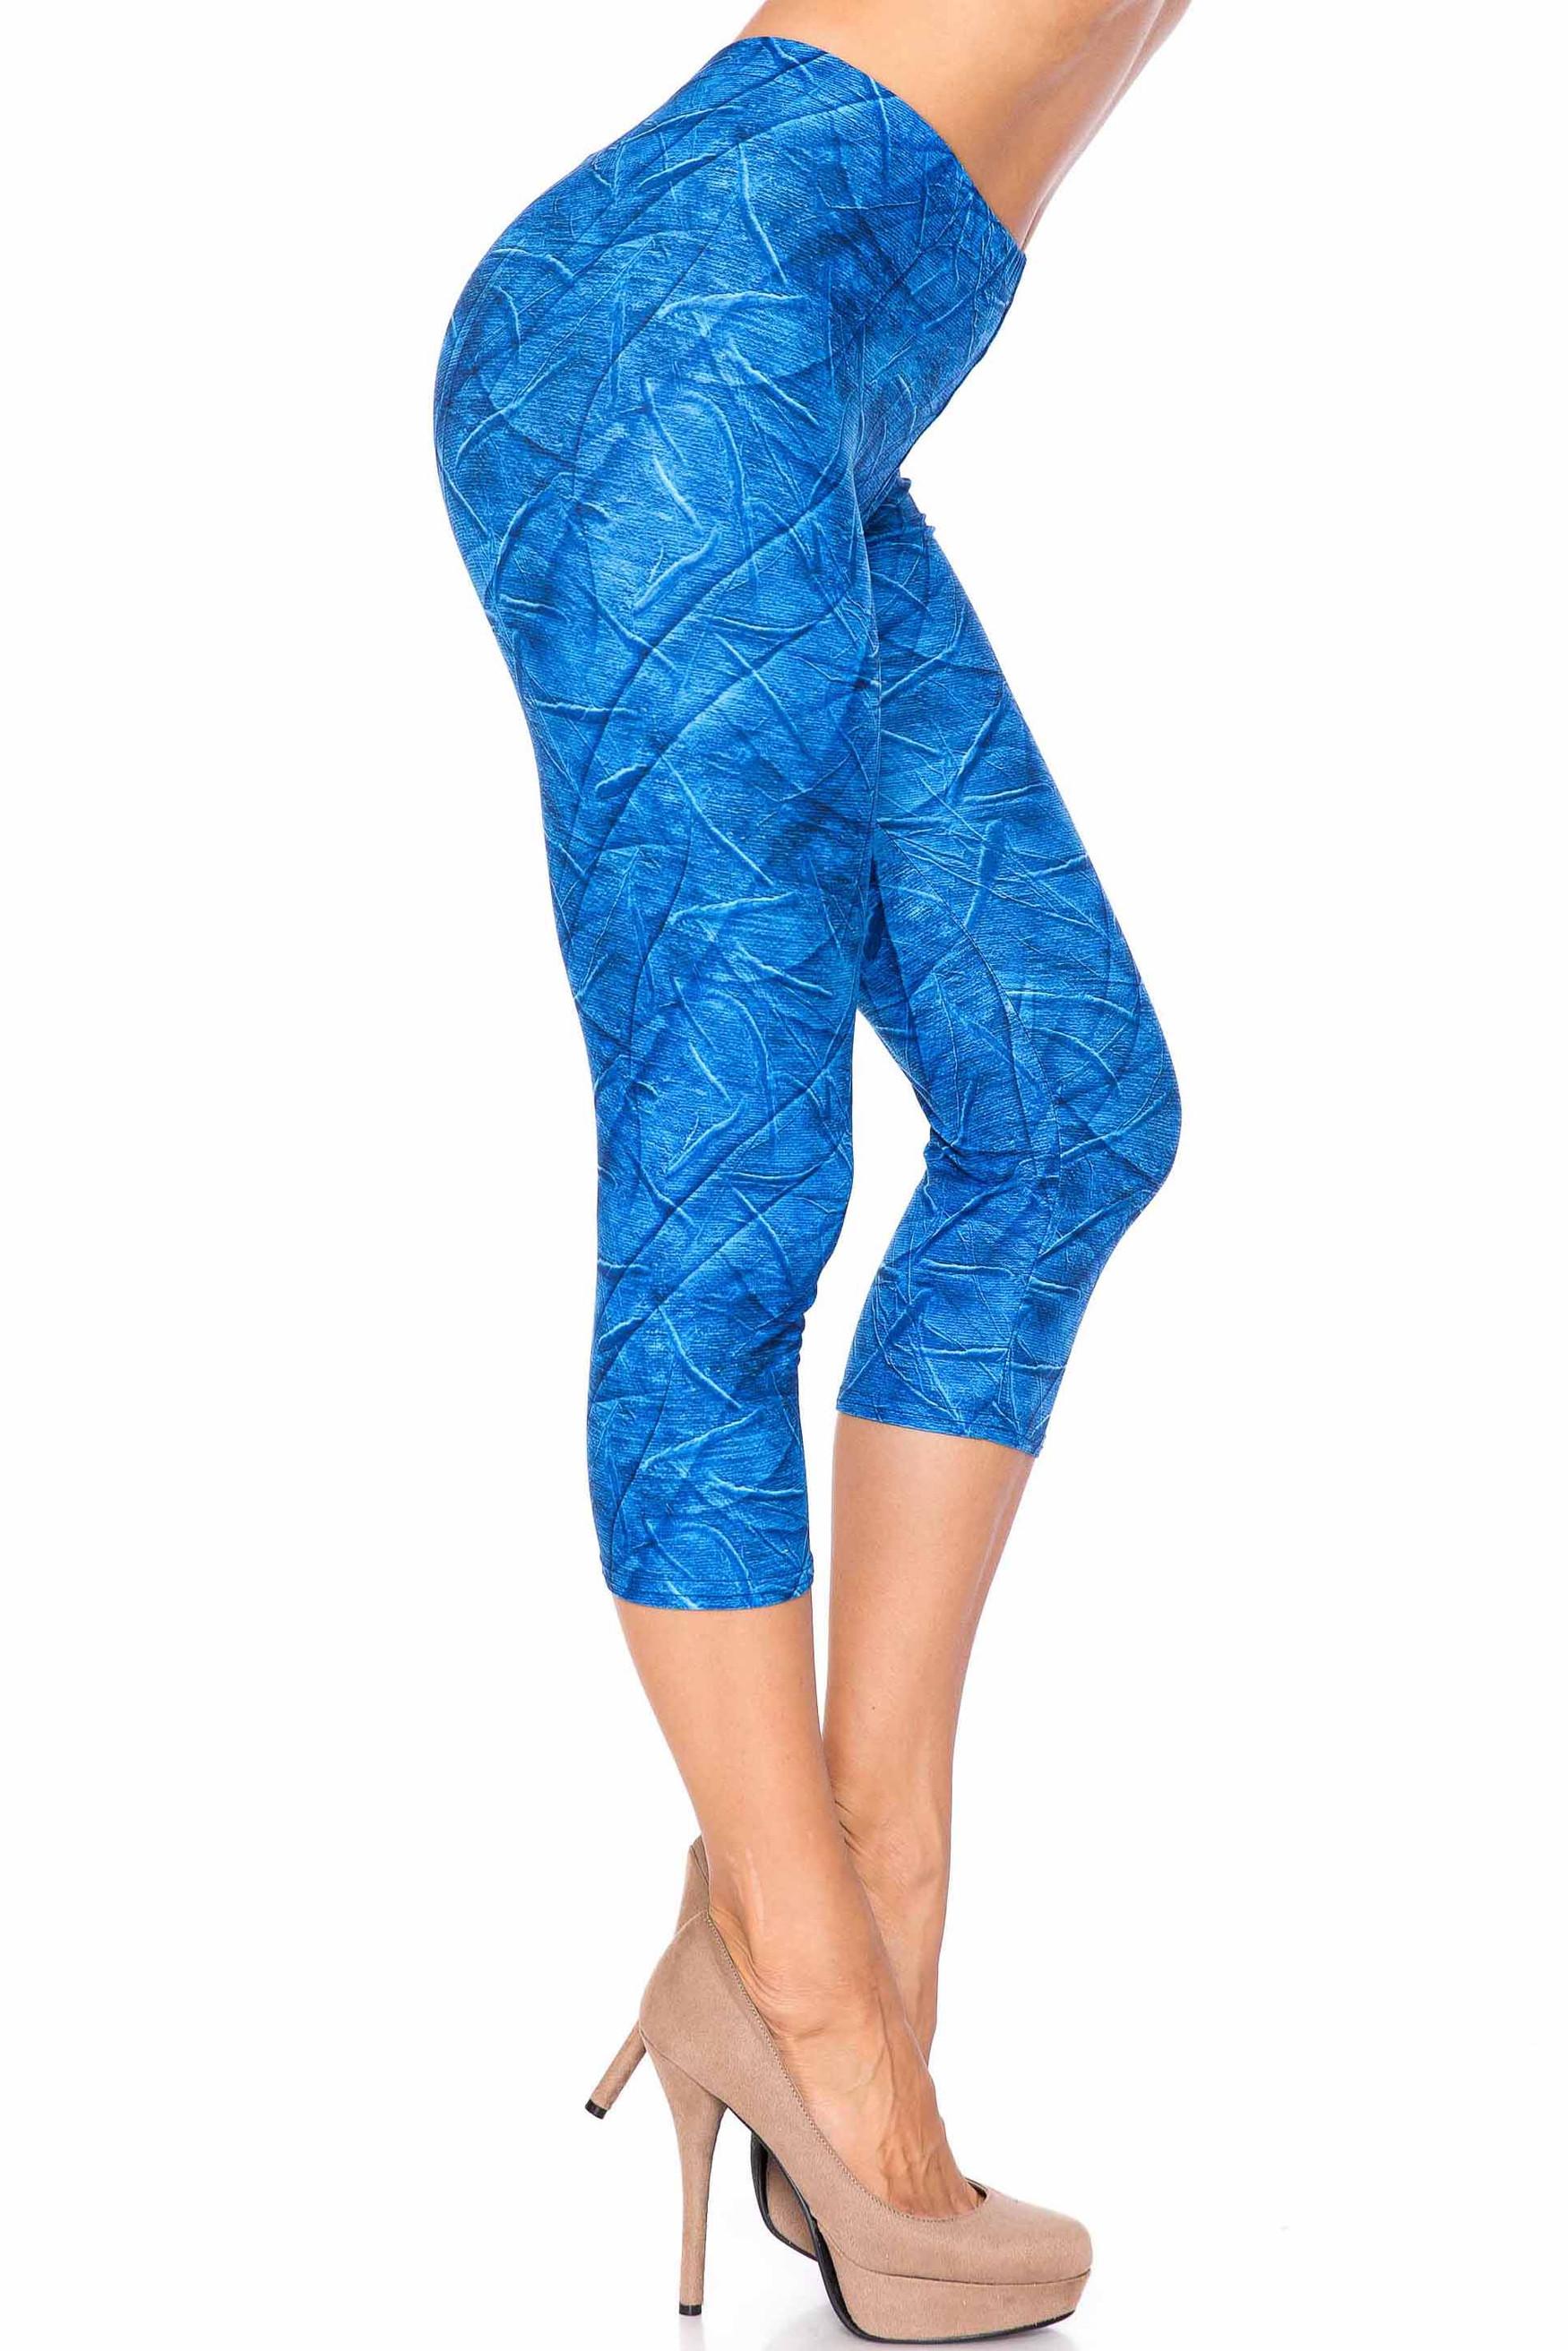 Creamy Soft Blue Wrinkled Denim Capris - USA Fashion™